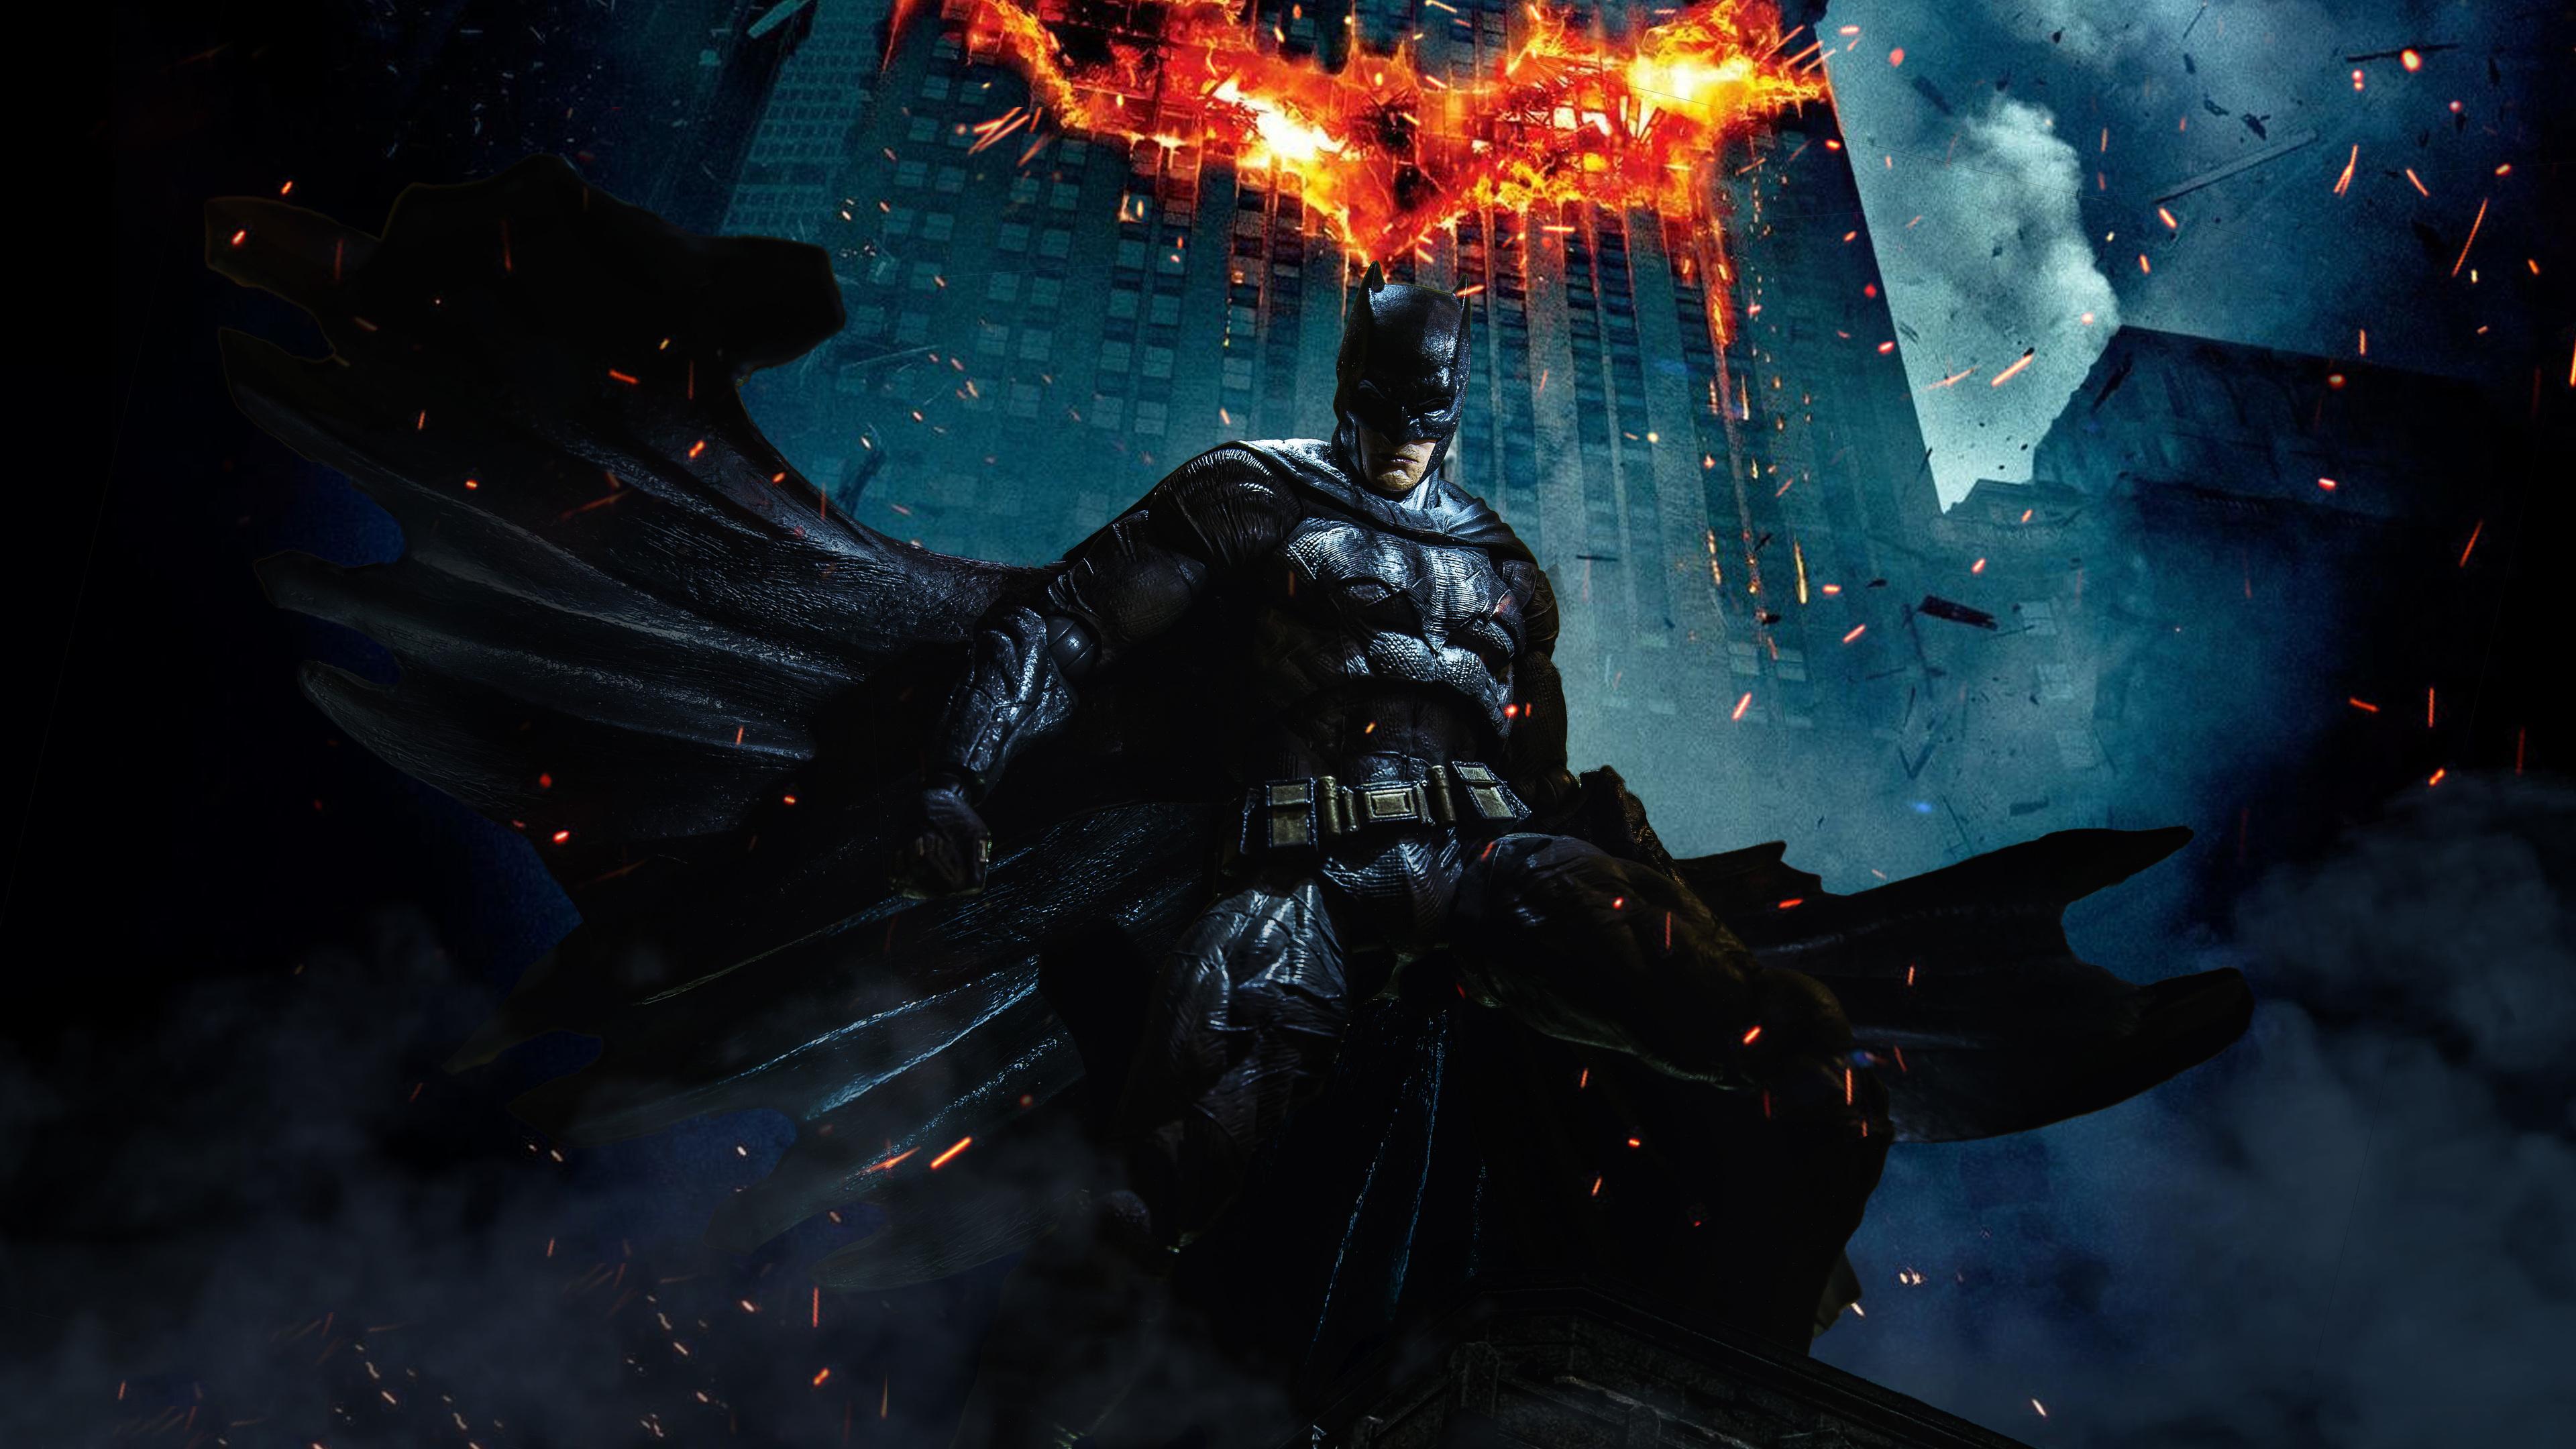 1280x1280 Car Wallpaper Batman Dark Knight 5k Superheroes Wallpapers Hd